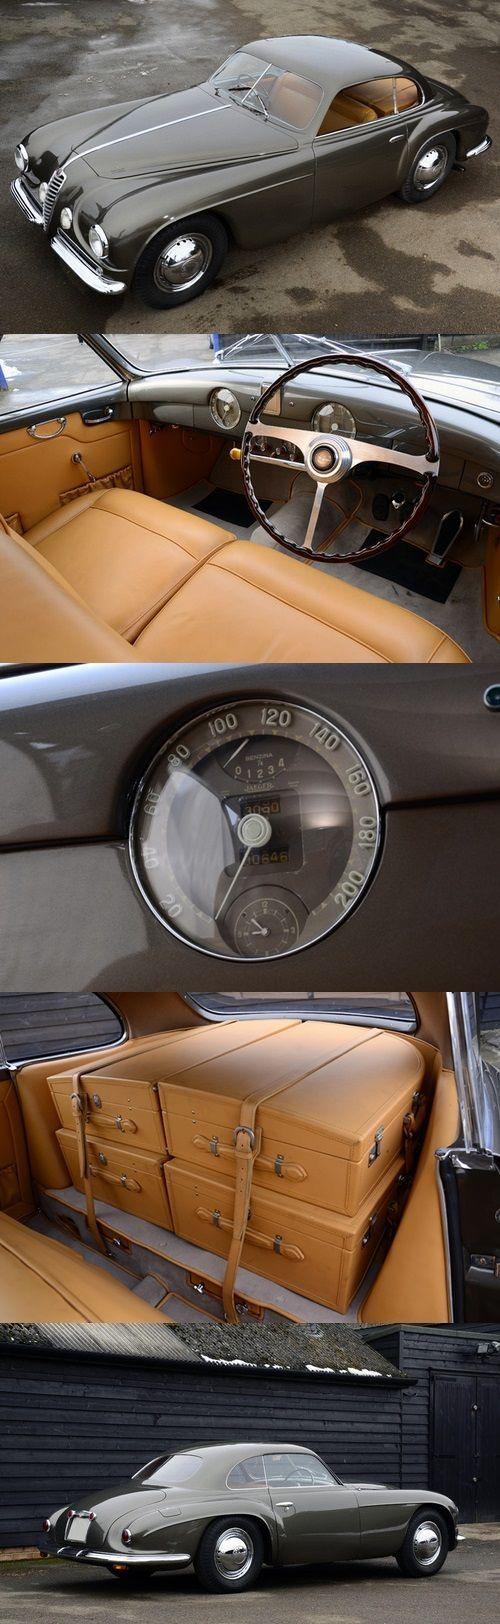 1950 Alfa Romeo 6C 2500SS Villa du2019Este Coupu00e9 by Touring - Bella macchina! - Luxury Car Connection